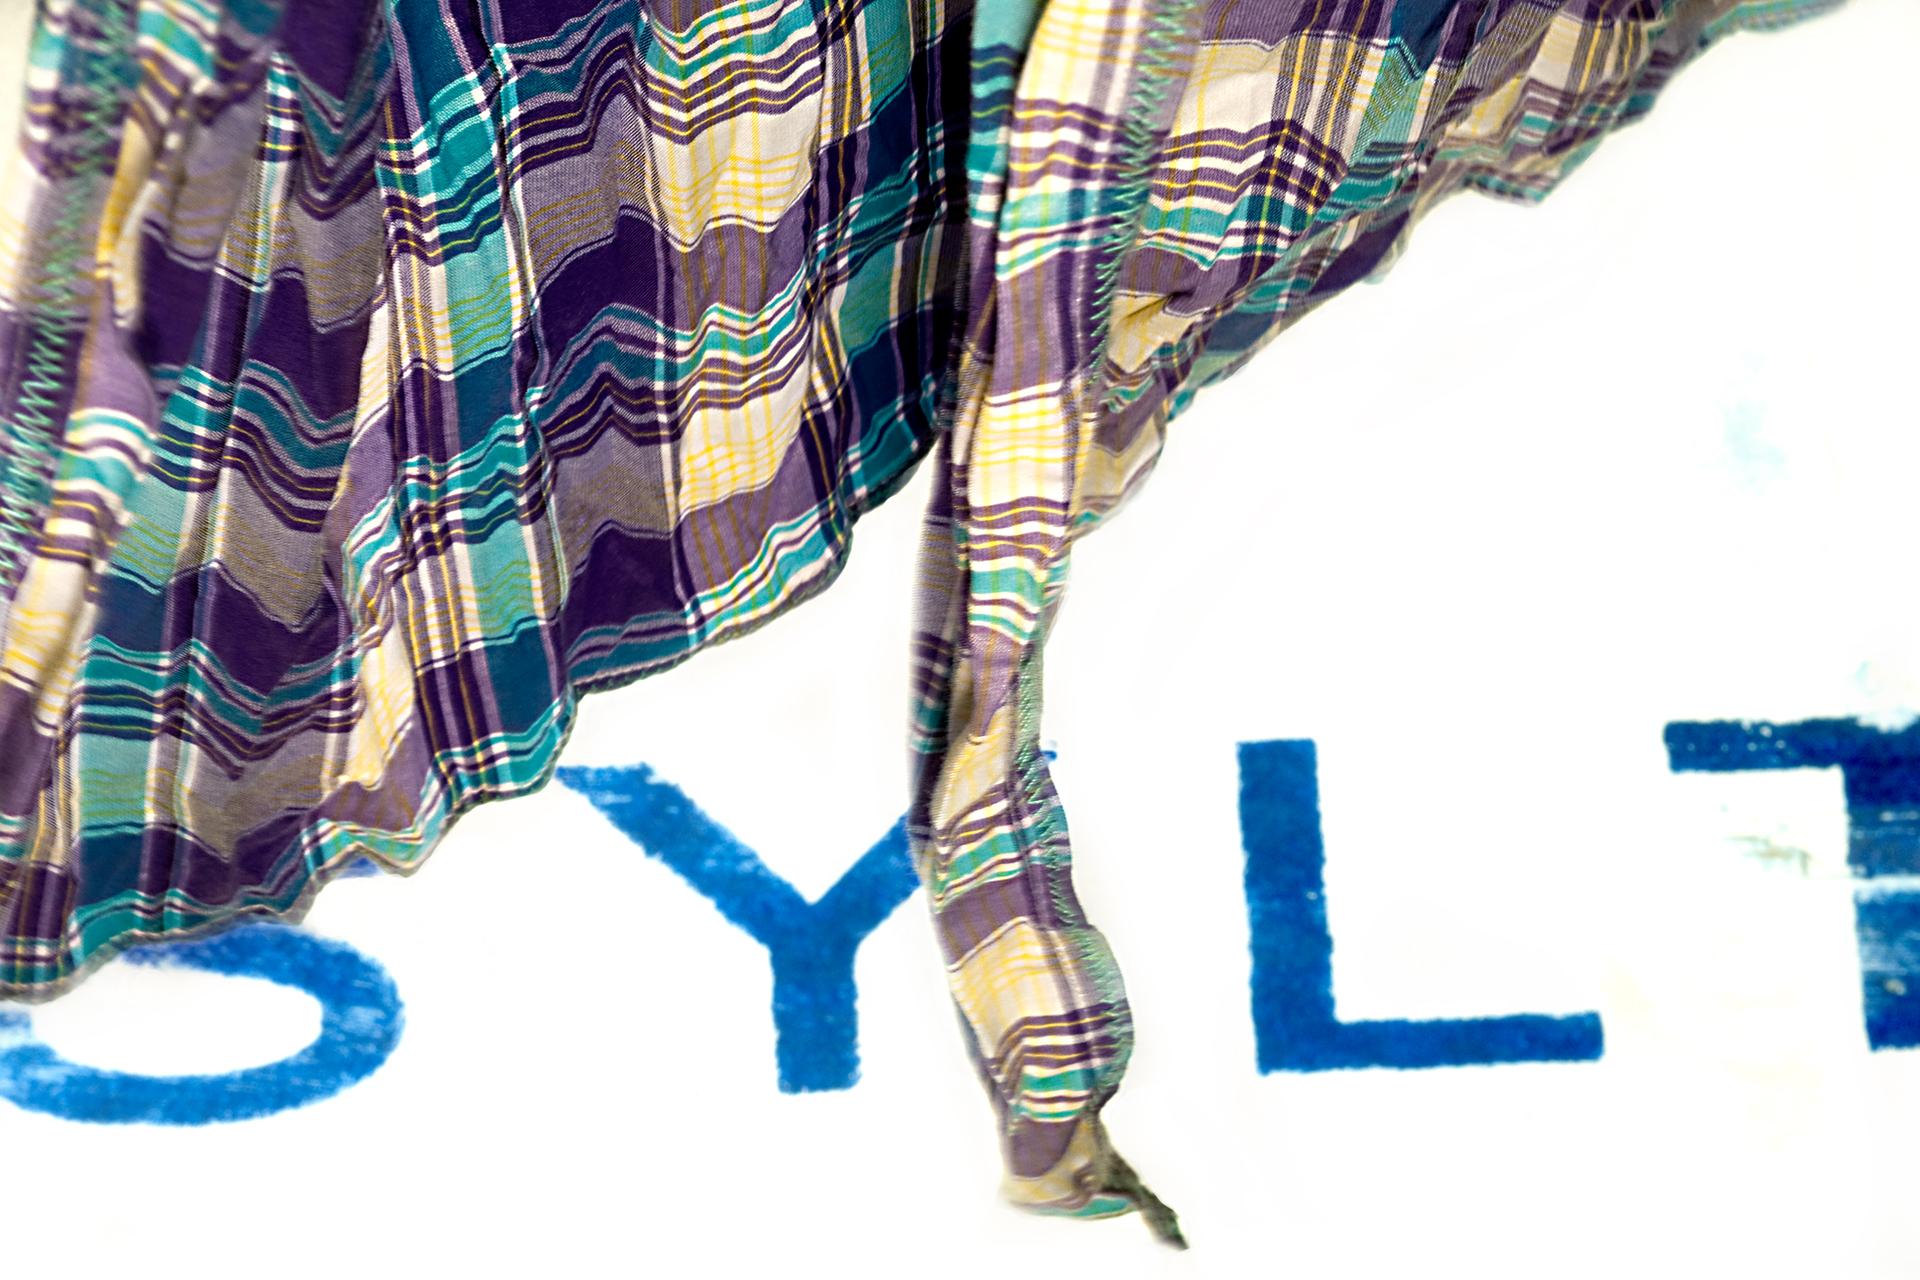 Fotokampagne Mode Polo Sylt, Anna M. Tränkner Fotografie 6